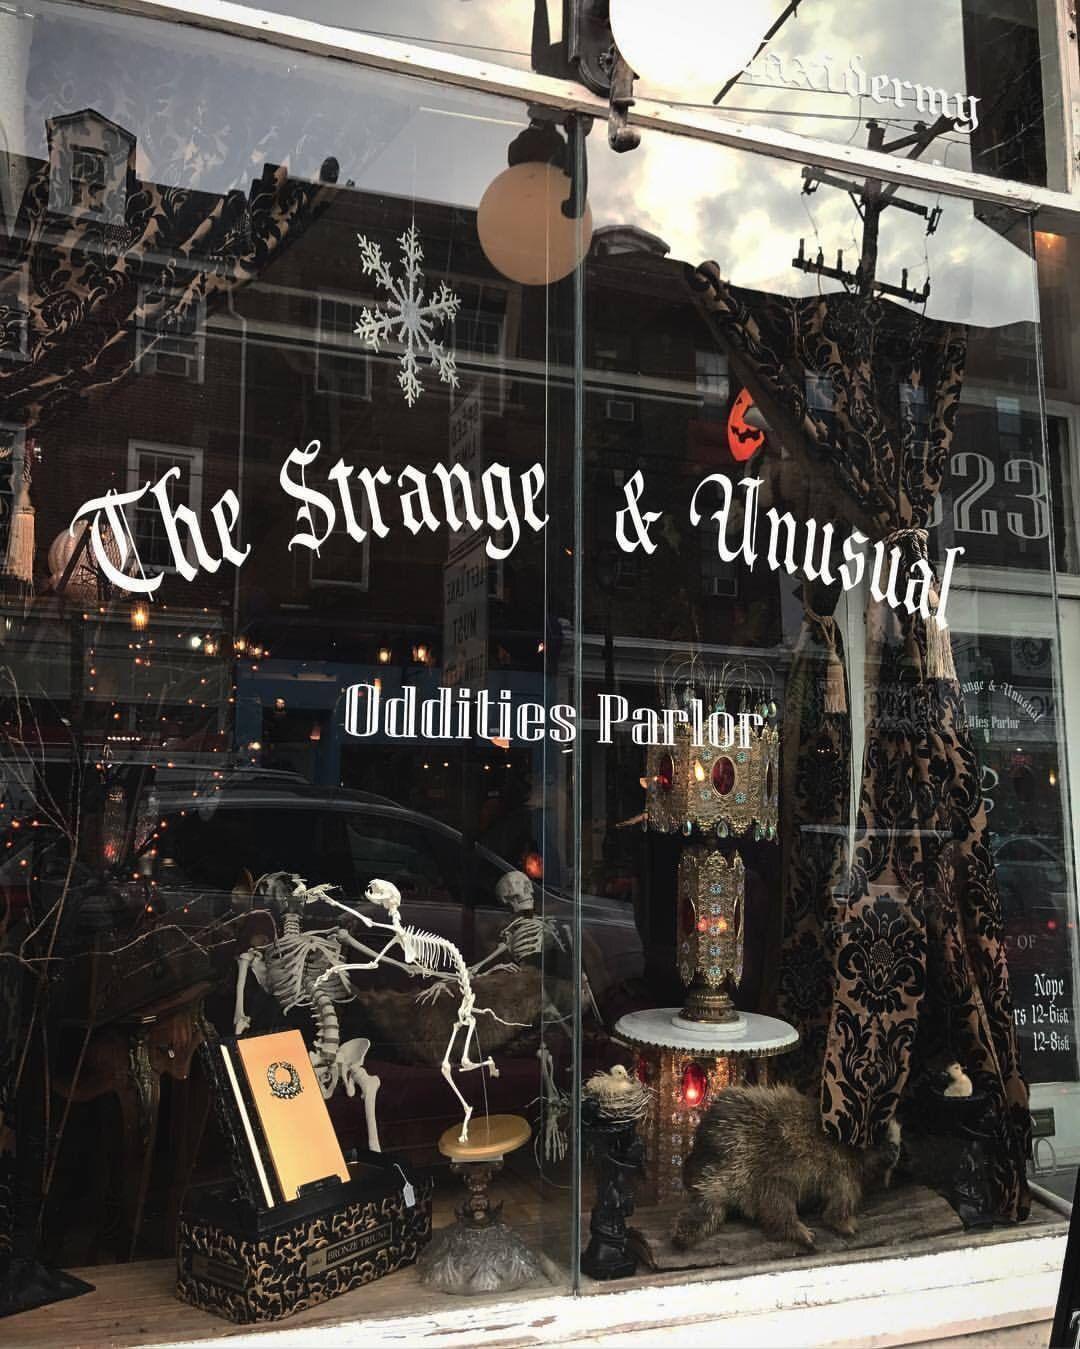 The Strange & Unusual Oddities Parlor | Kingston, Pennsylvania #halloweenaesthetic